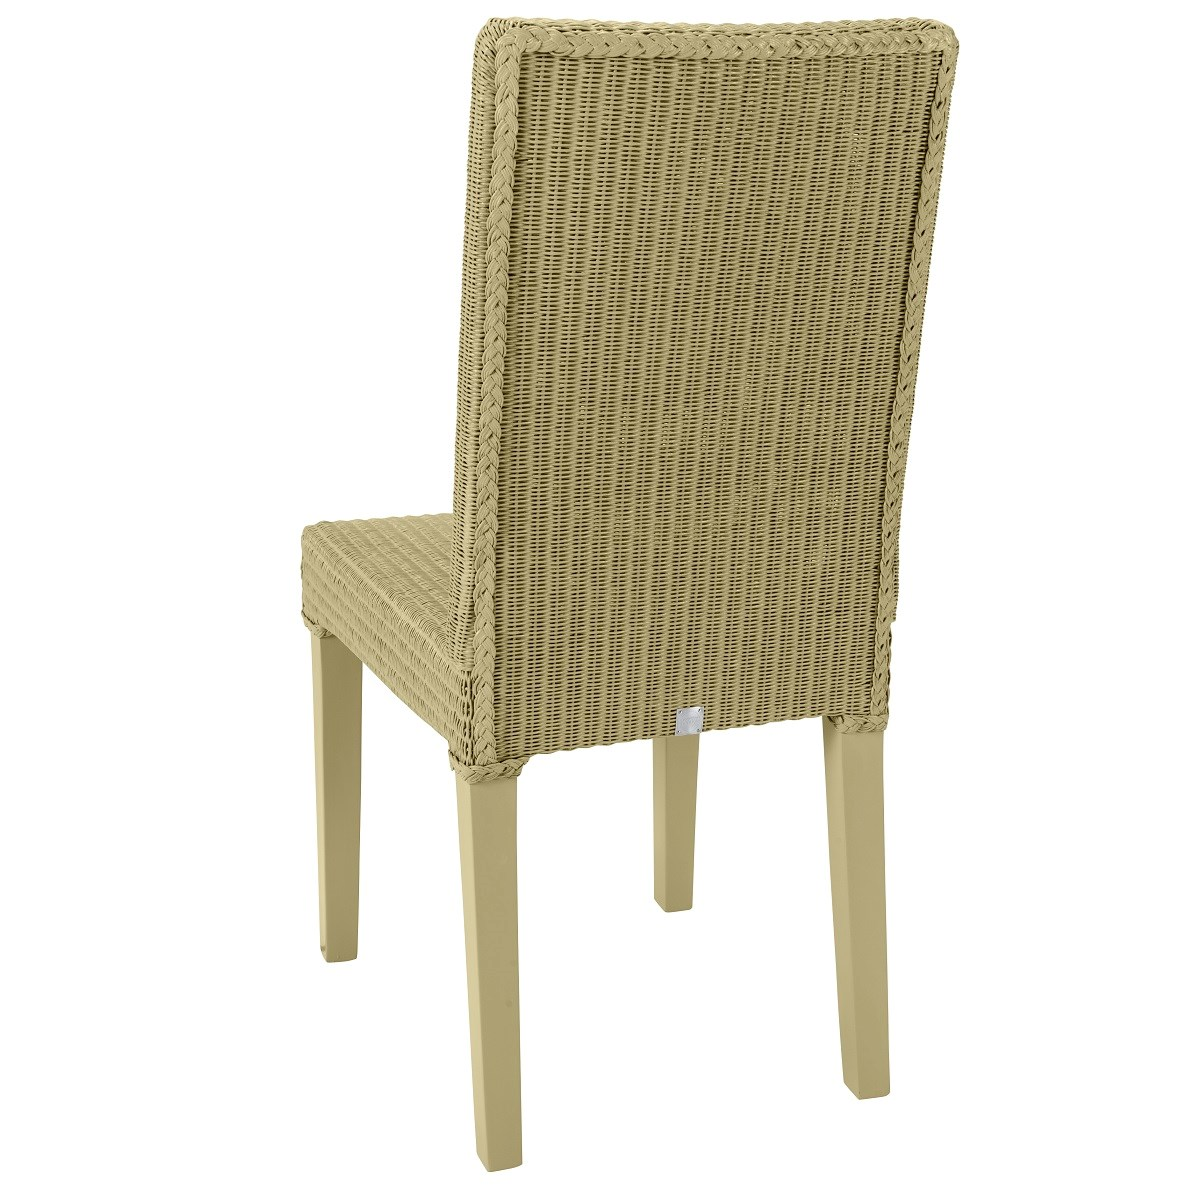 Chaise en Lloyd Loom jaune paille